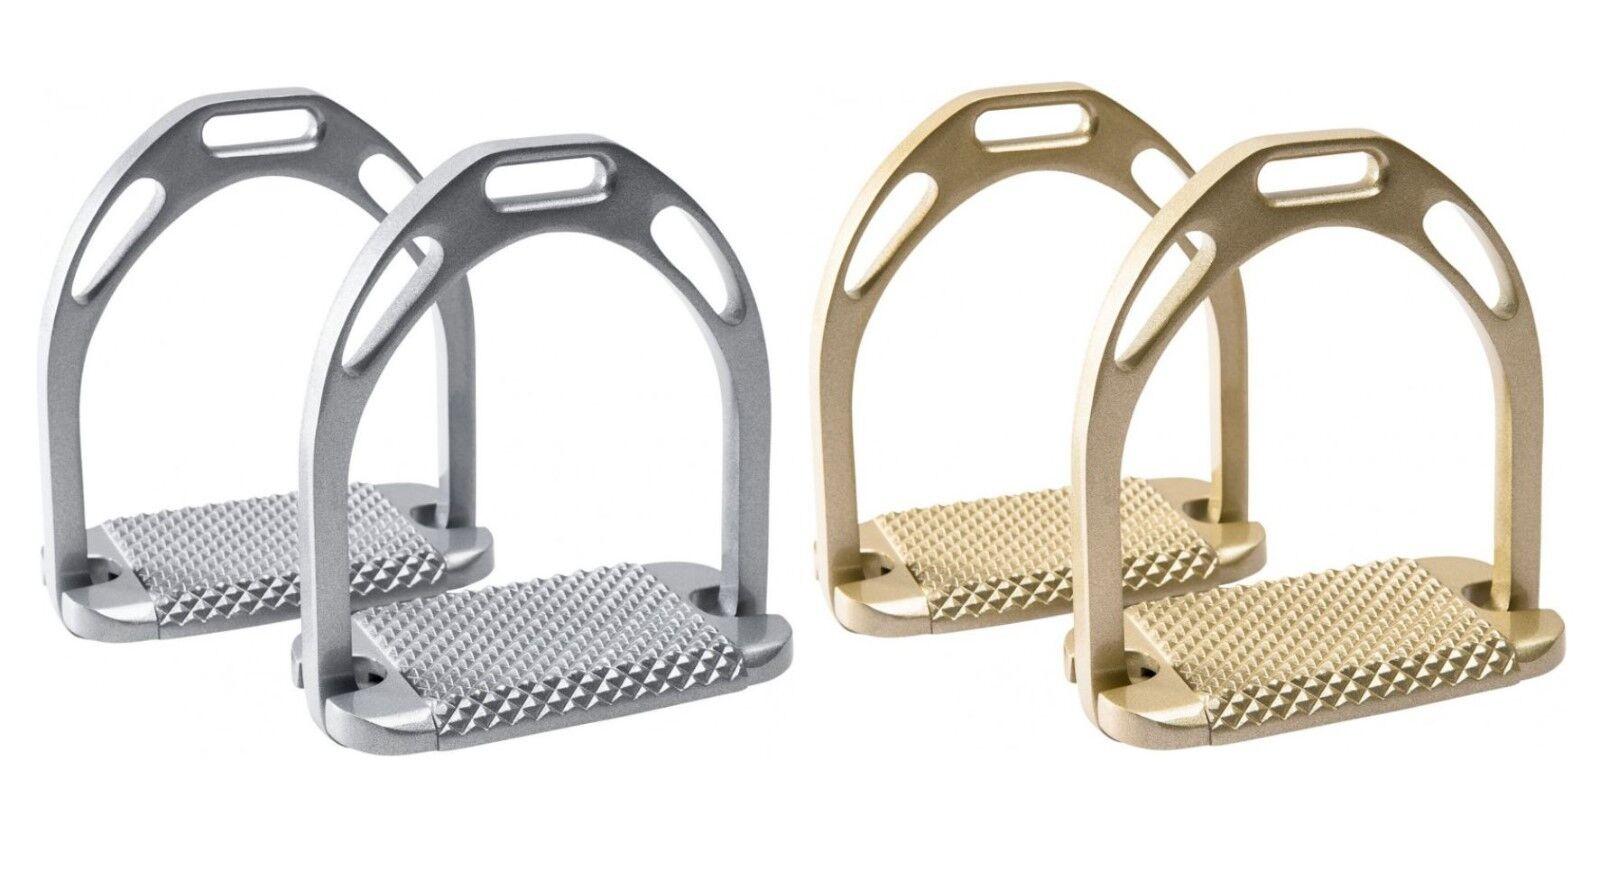 (Ekkia) Feeling  Large Pro Pro Pro  Steigbügel Aluminium, 12,5cm  | Mode-Muster  | Clearance Sale  1f7c71